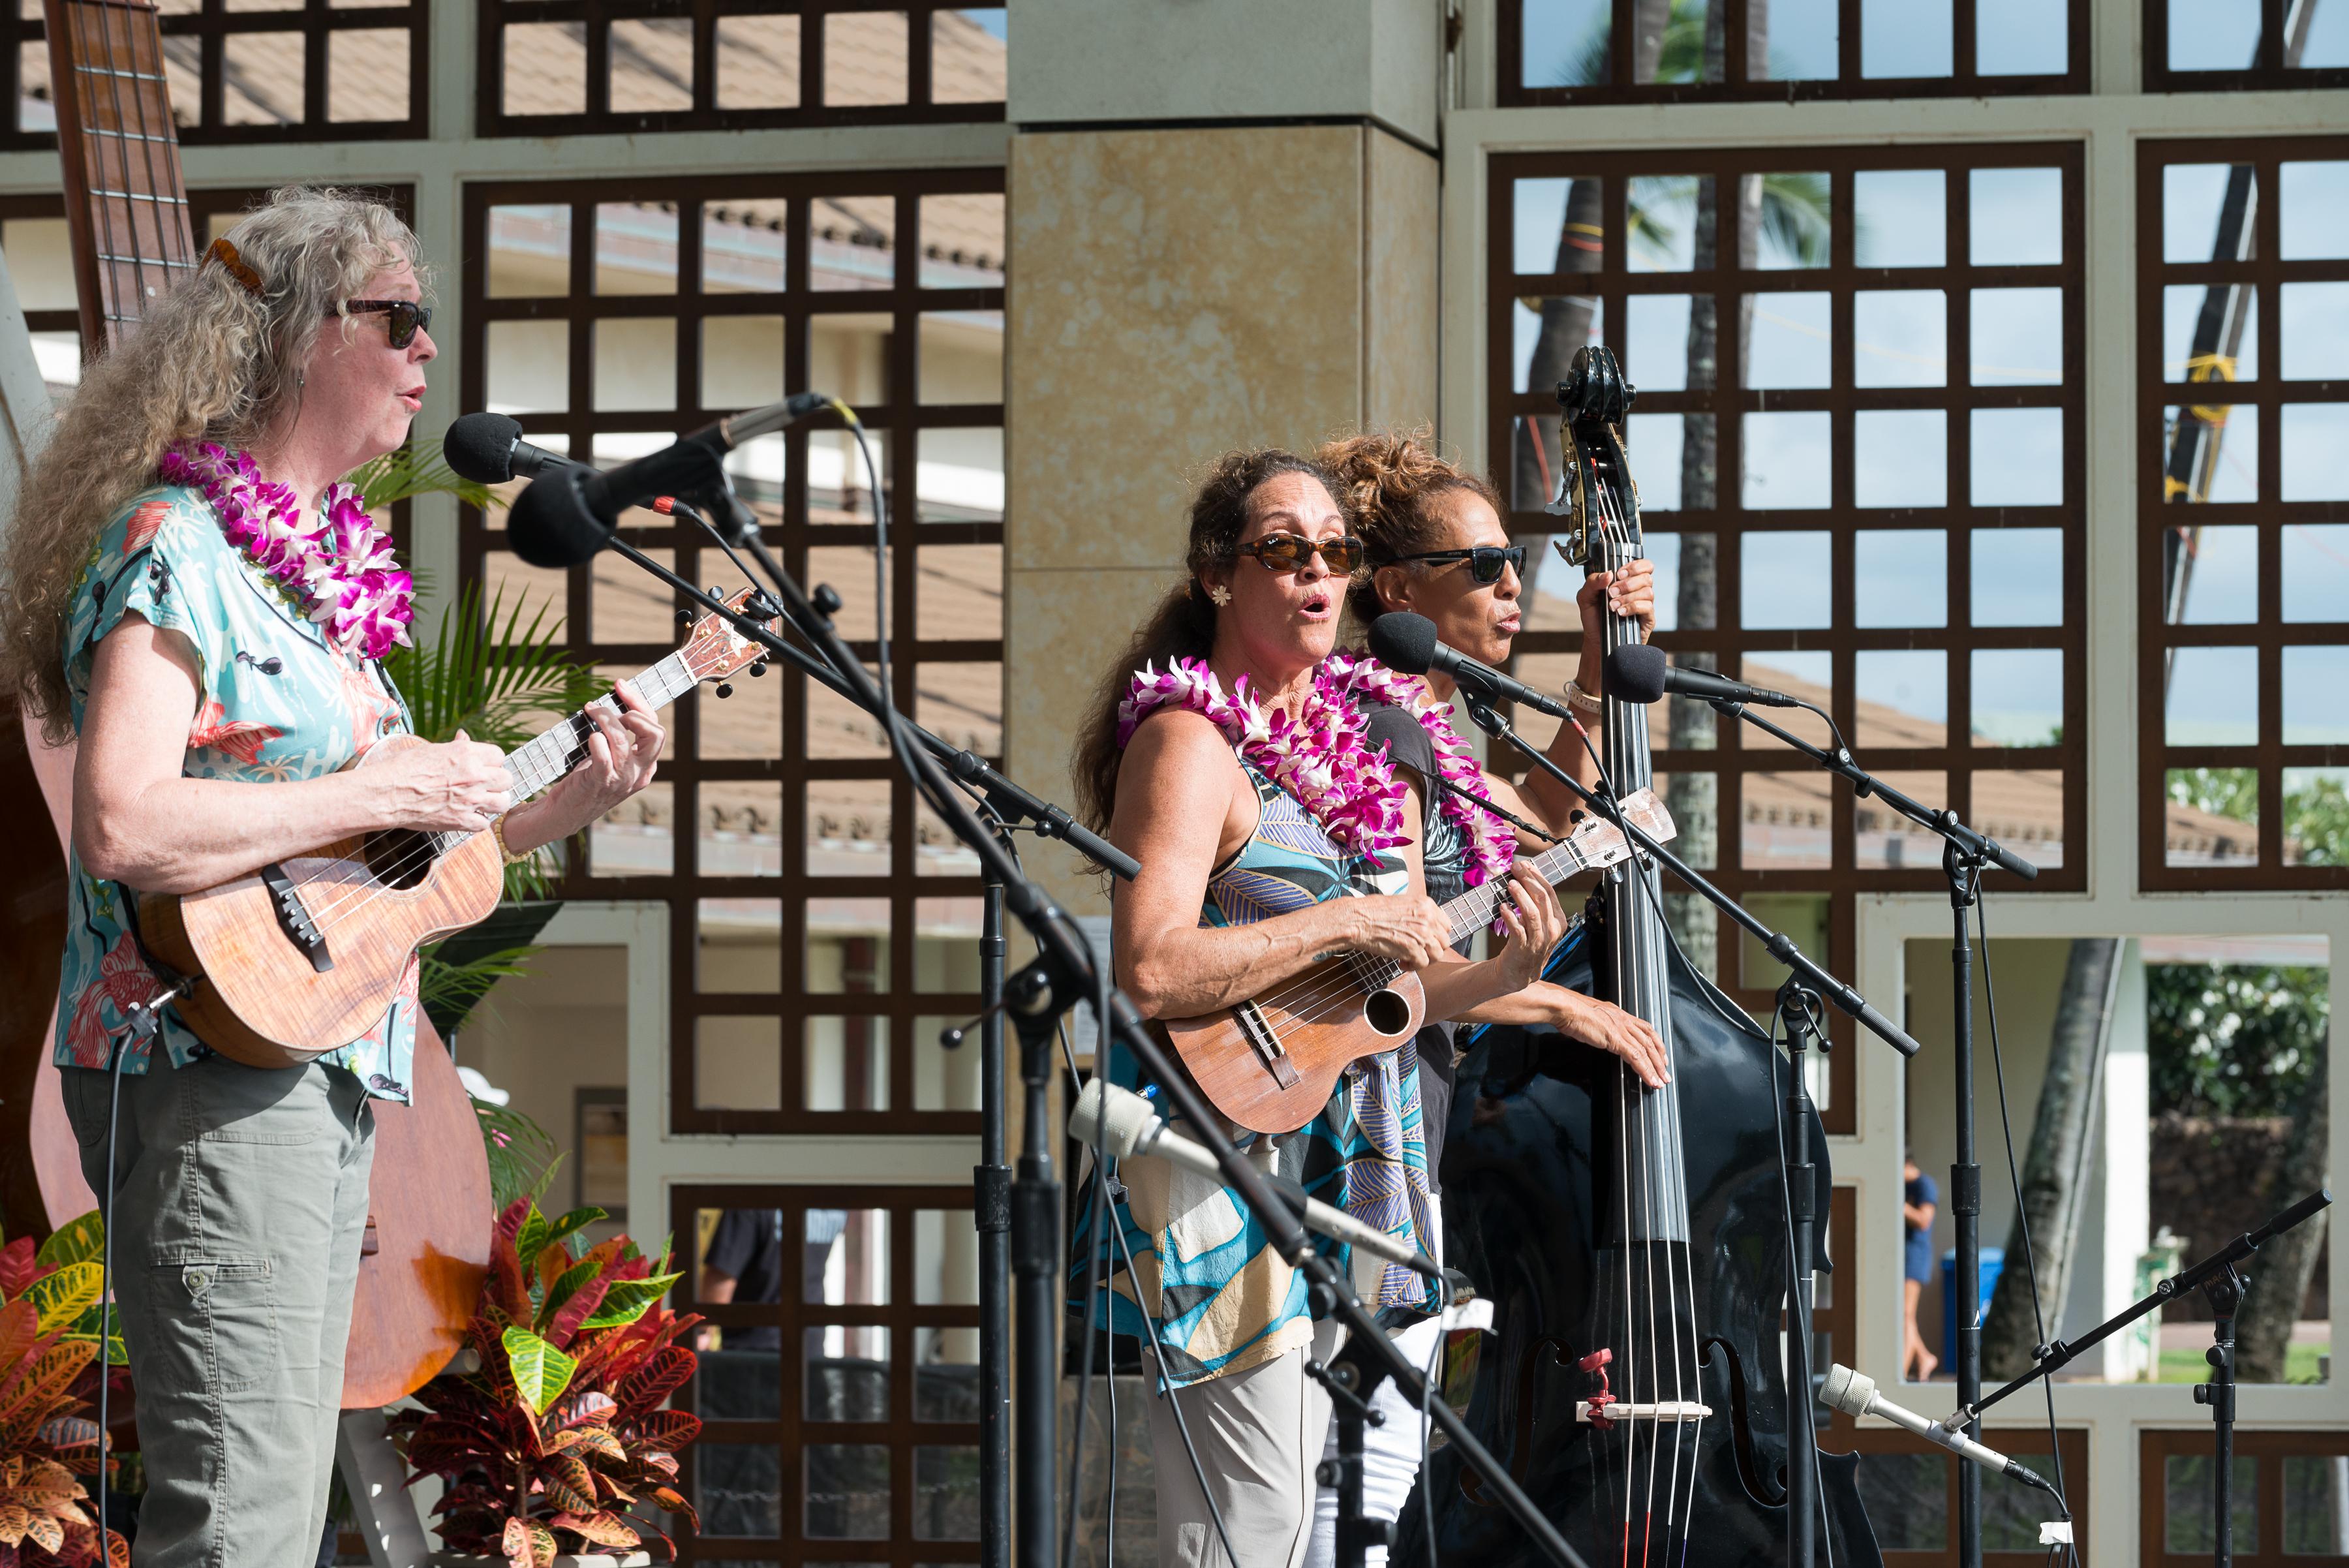 11th Annual Maui 'Ukulele Festival. PC: The Hula Honey, photo by Aubrey Hord.